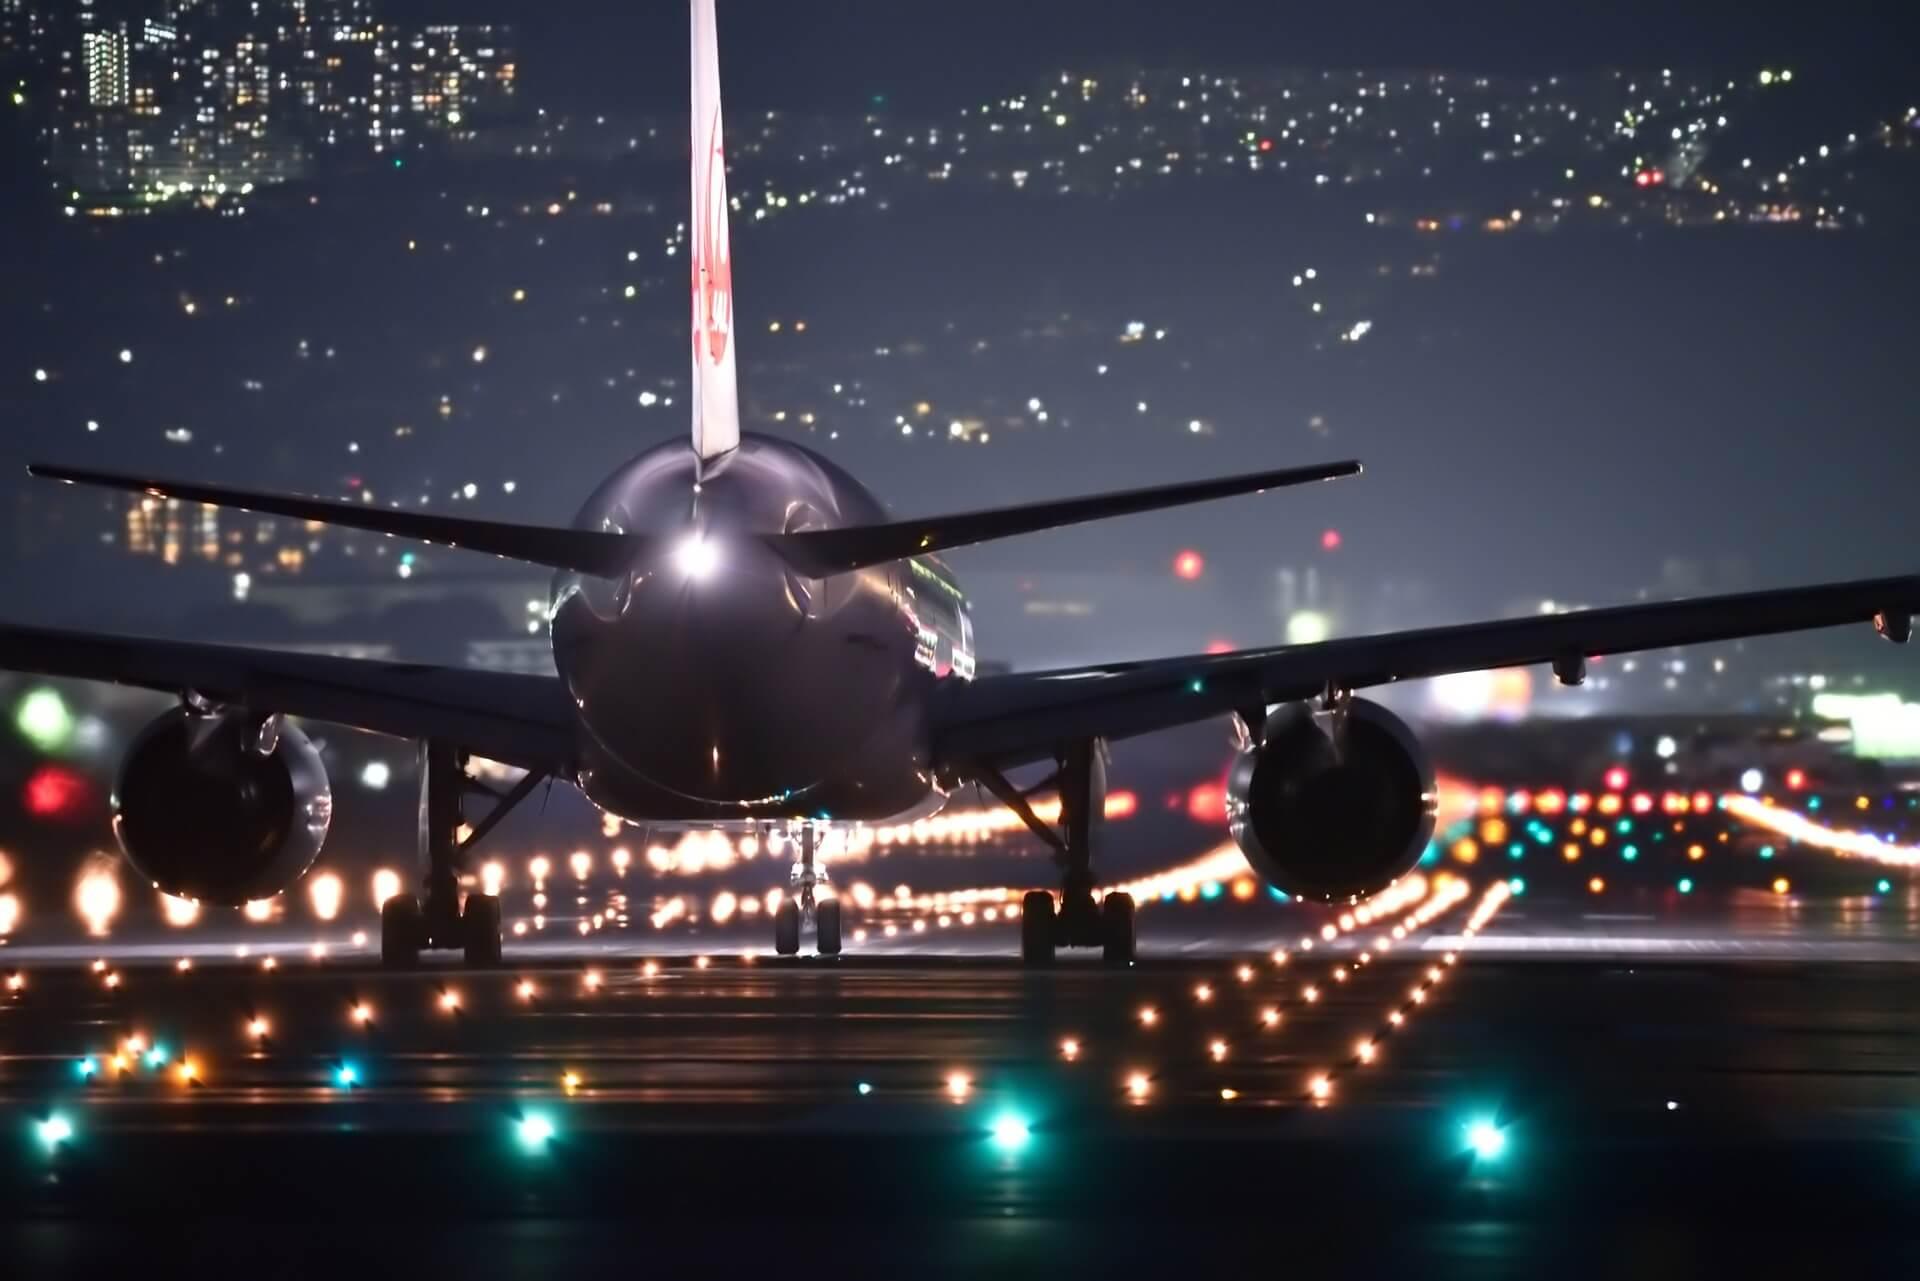 Trabzon Araç Kiralama - Trabzon Havalimanı